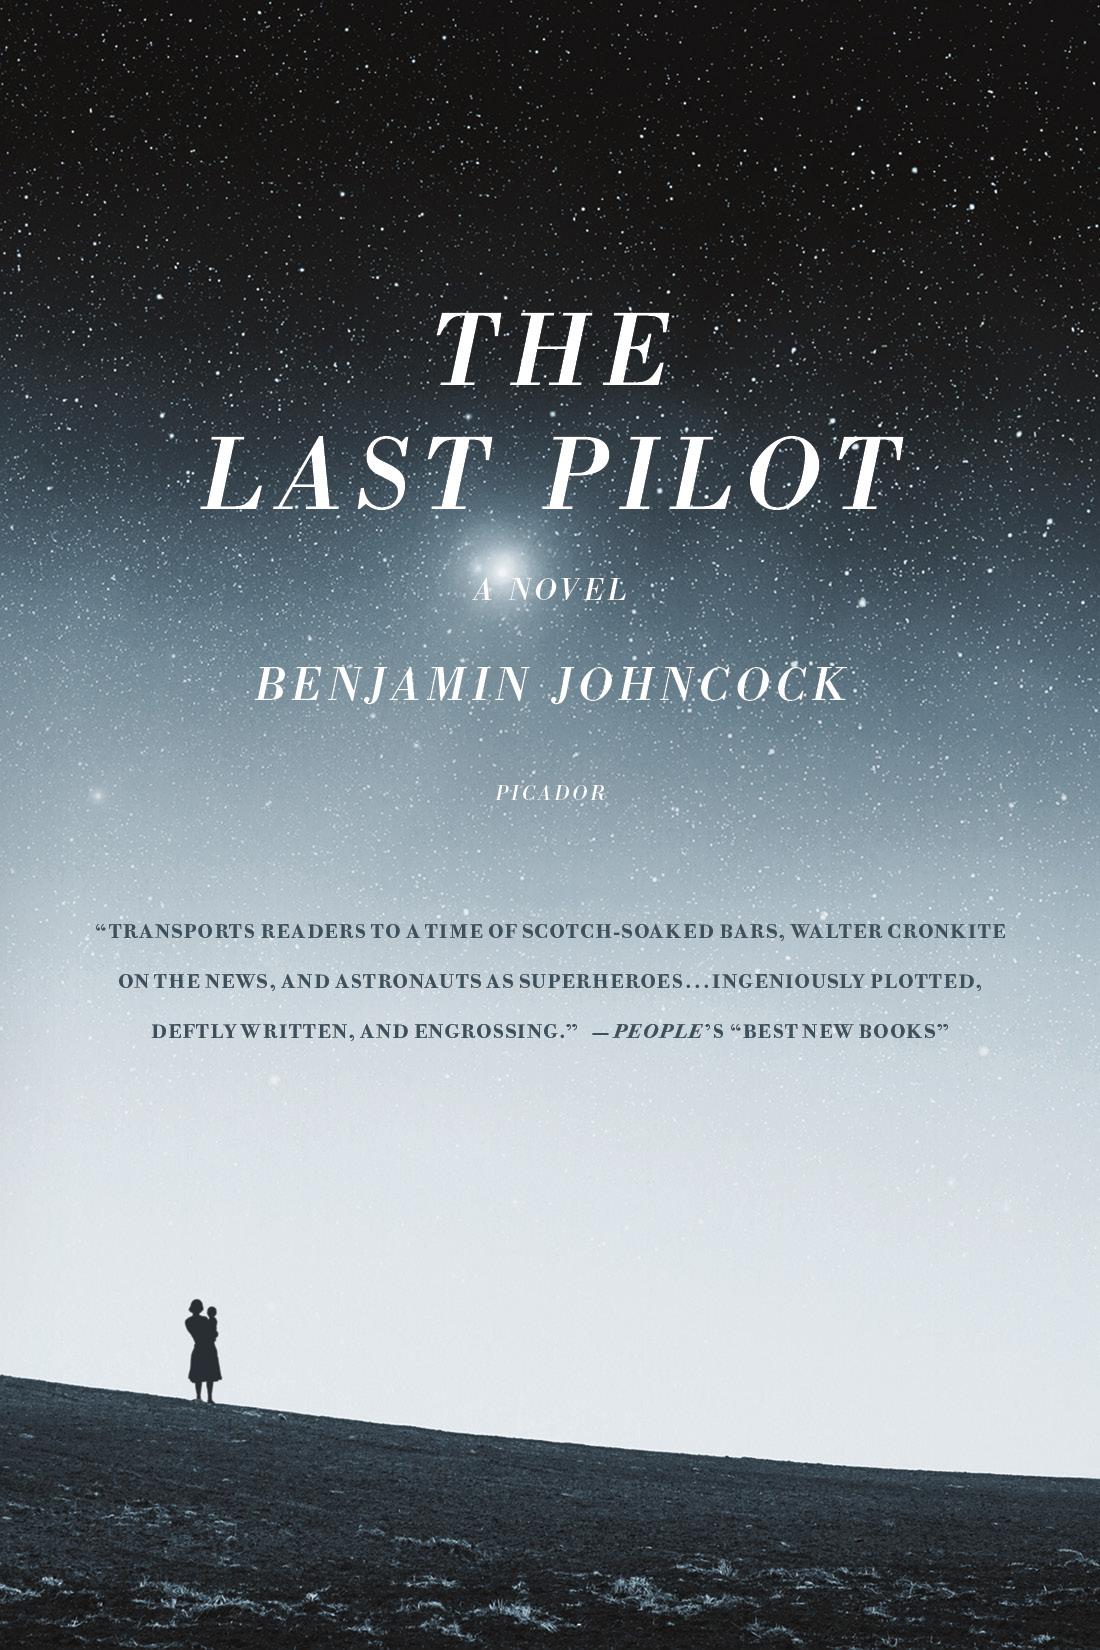 THE LAST PILOT Picador ppbk cover.jpg